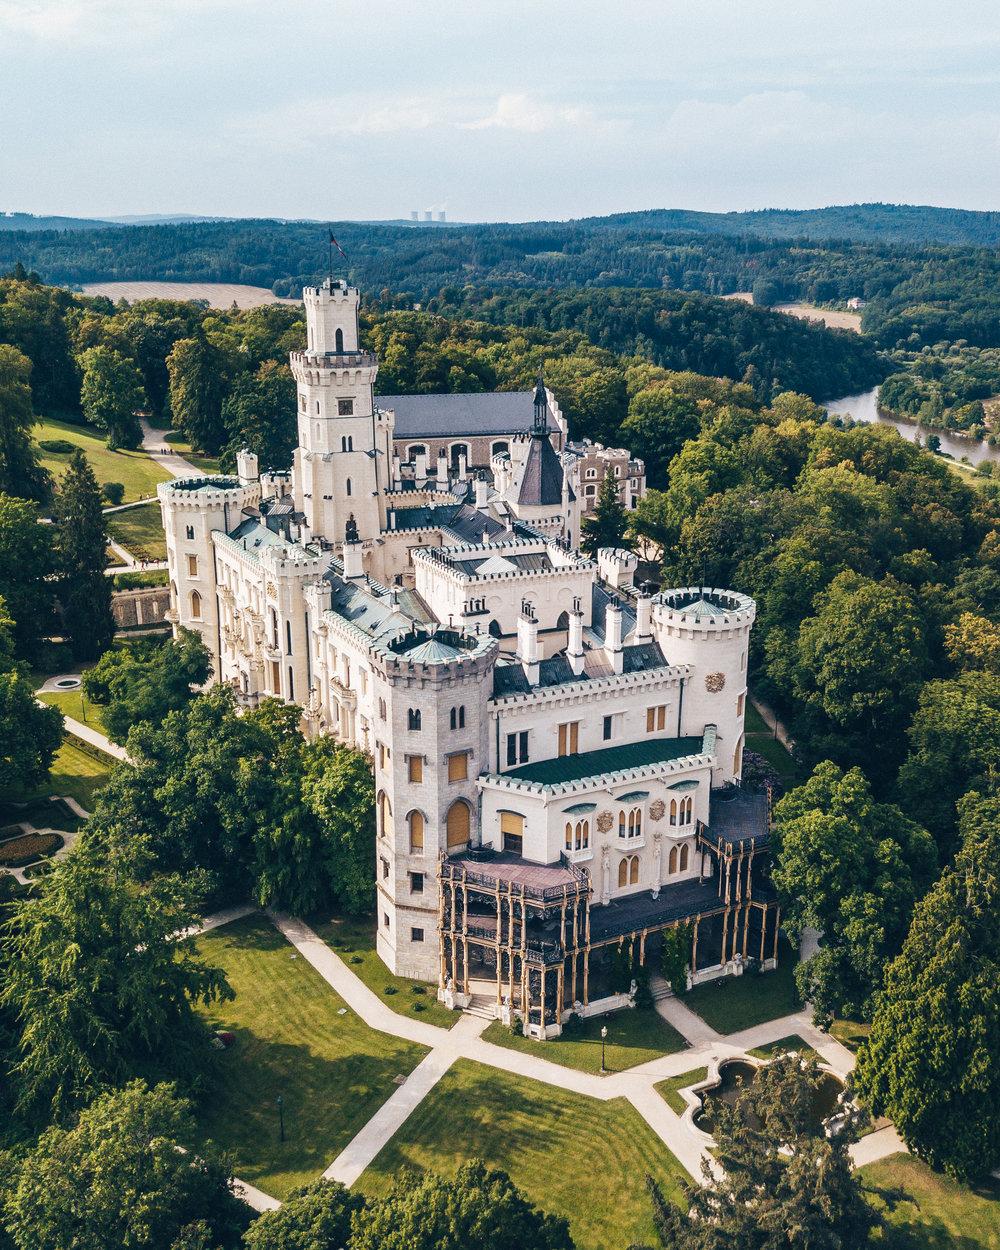 Hluboka Castle - Hluboka nad Vltavou, Czech Republic